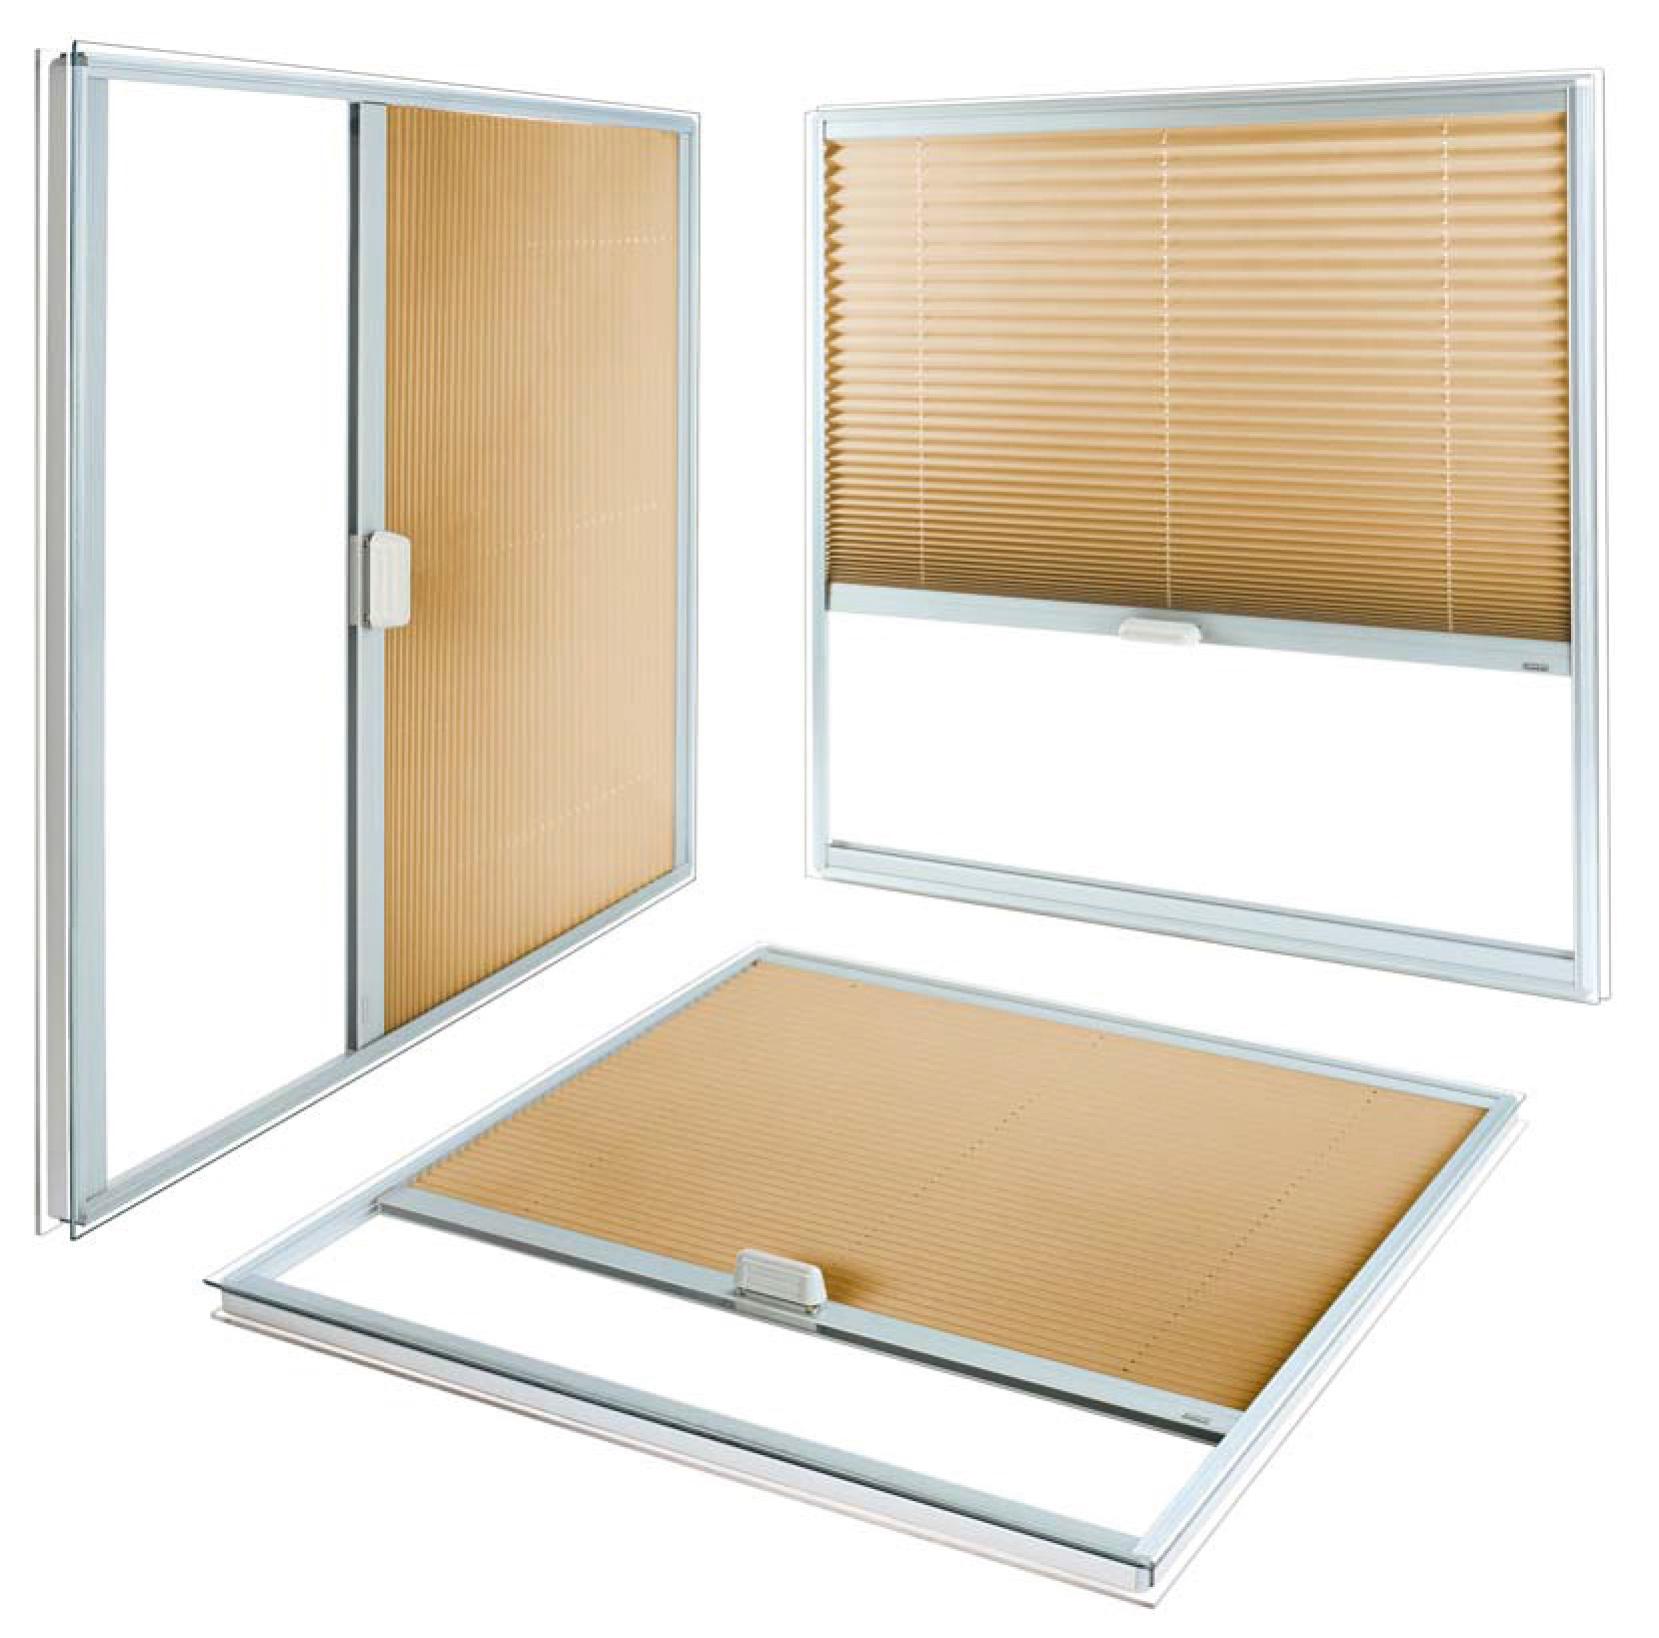 Veneziane e tende interno vetro okna samoraj porte e finestre in pvc dalla polonia - Tende finestre pvc ...